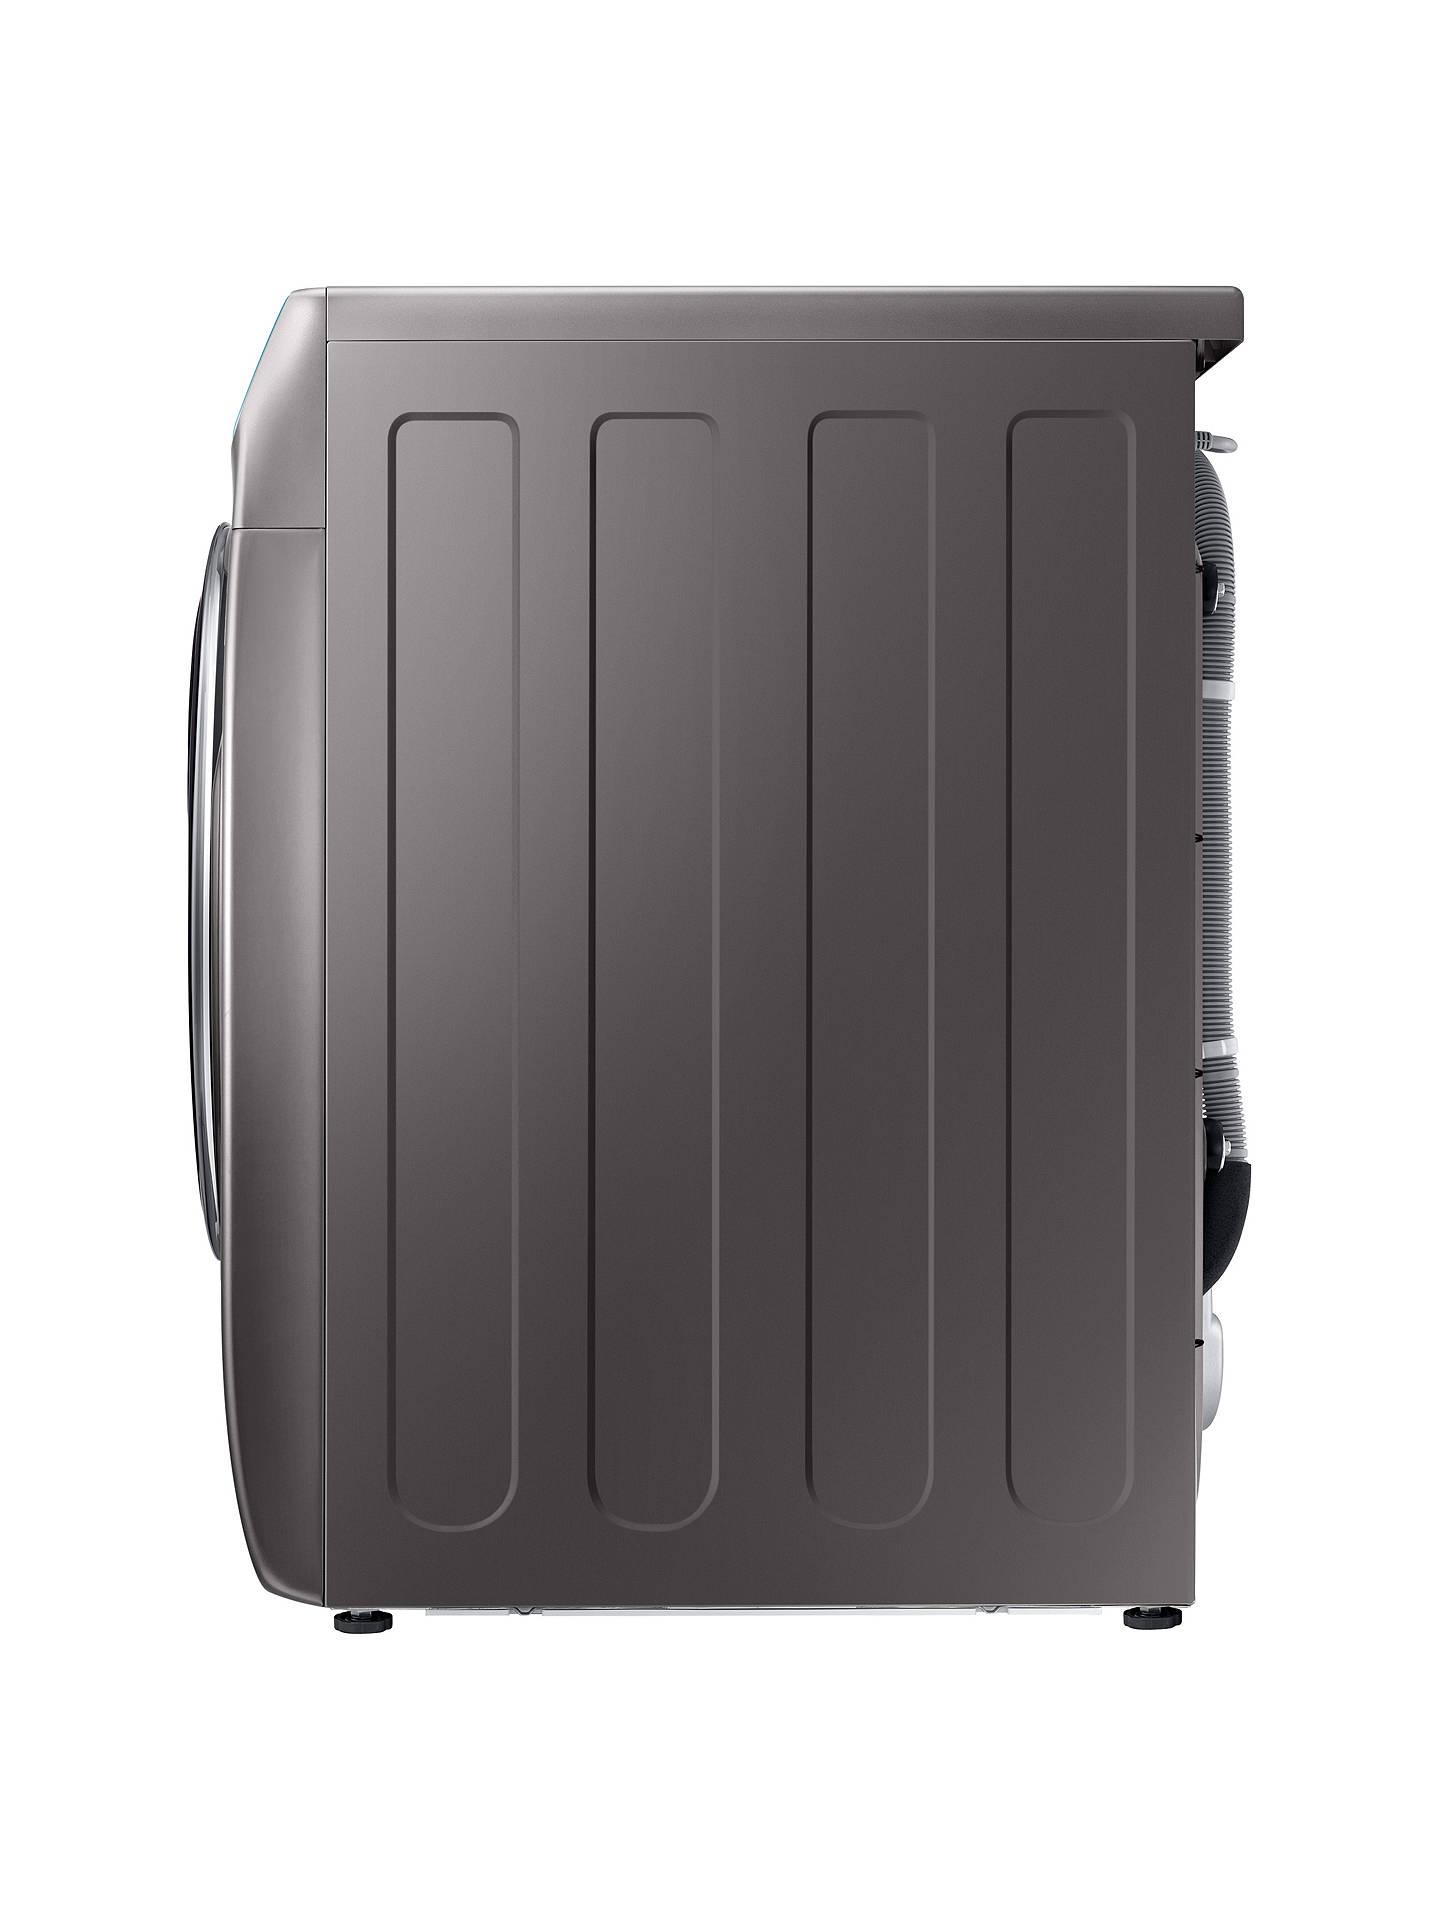 cdb9157ee529 ... BuySamsung WW10M86DQOO EU Freestanding QuickDrive Washing Machine